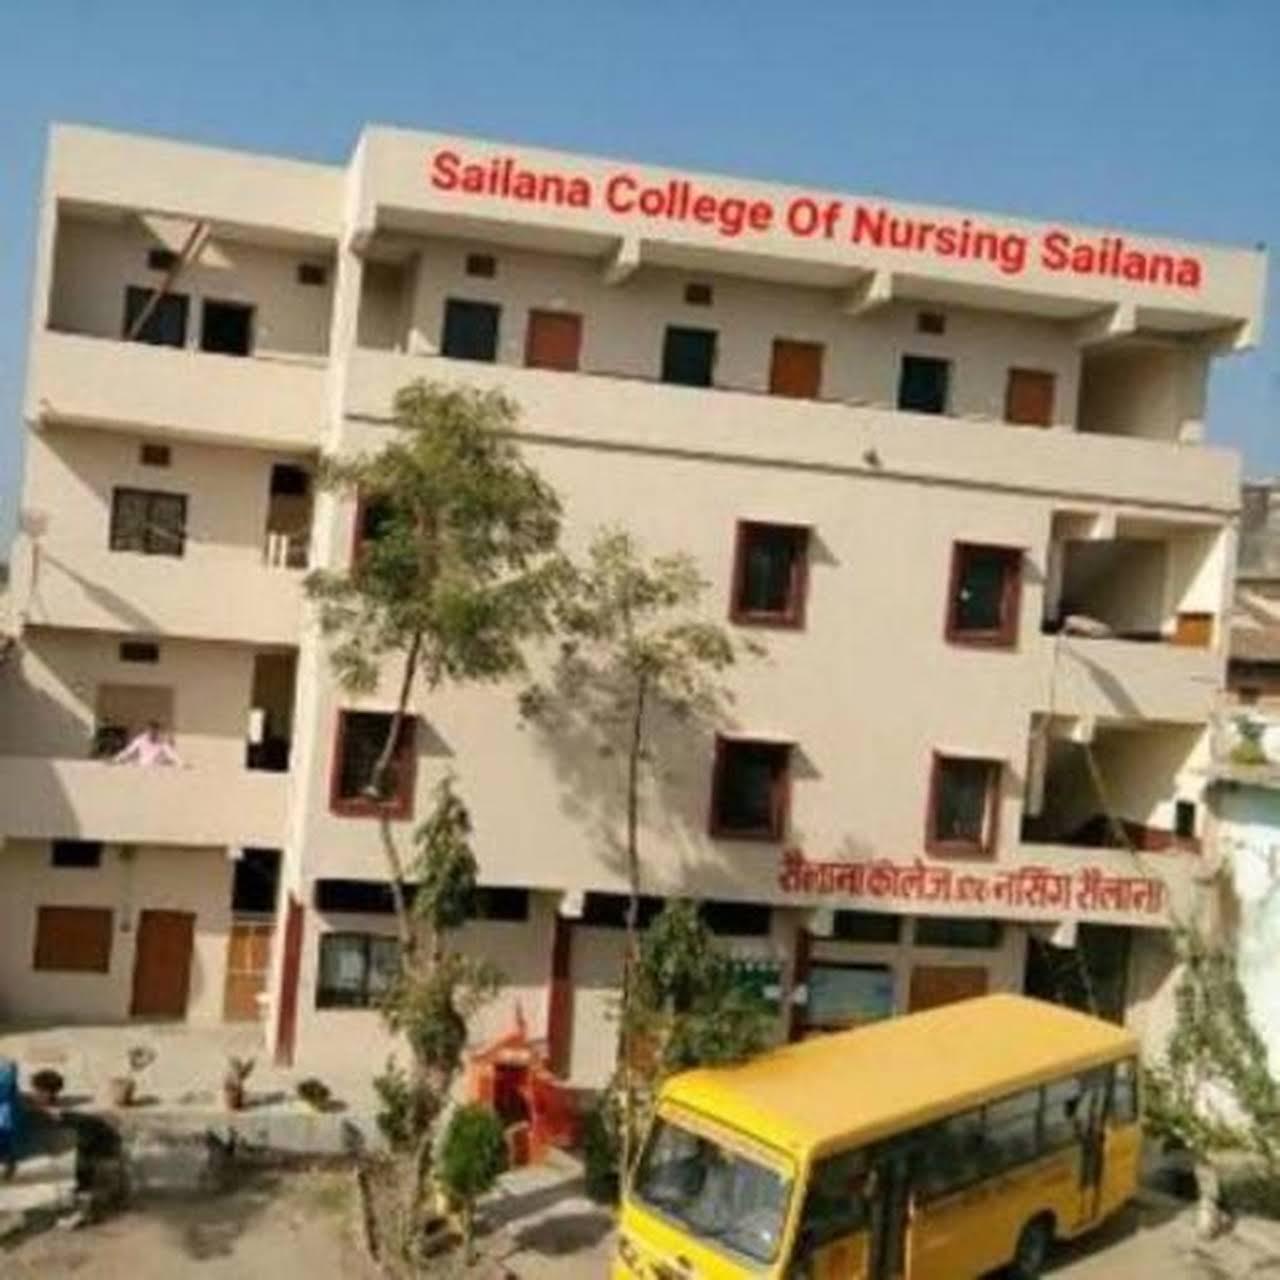 Sailana College Of Nursing Image